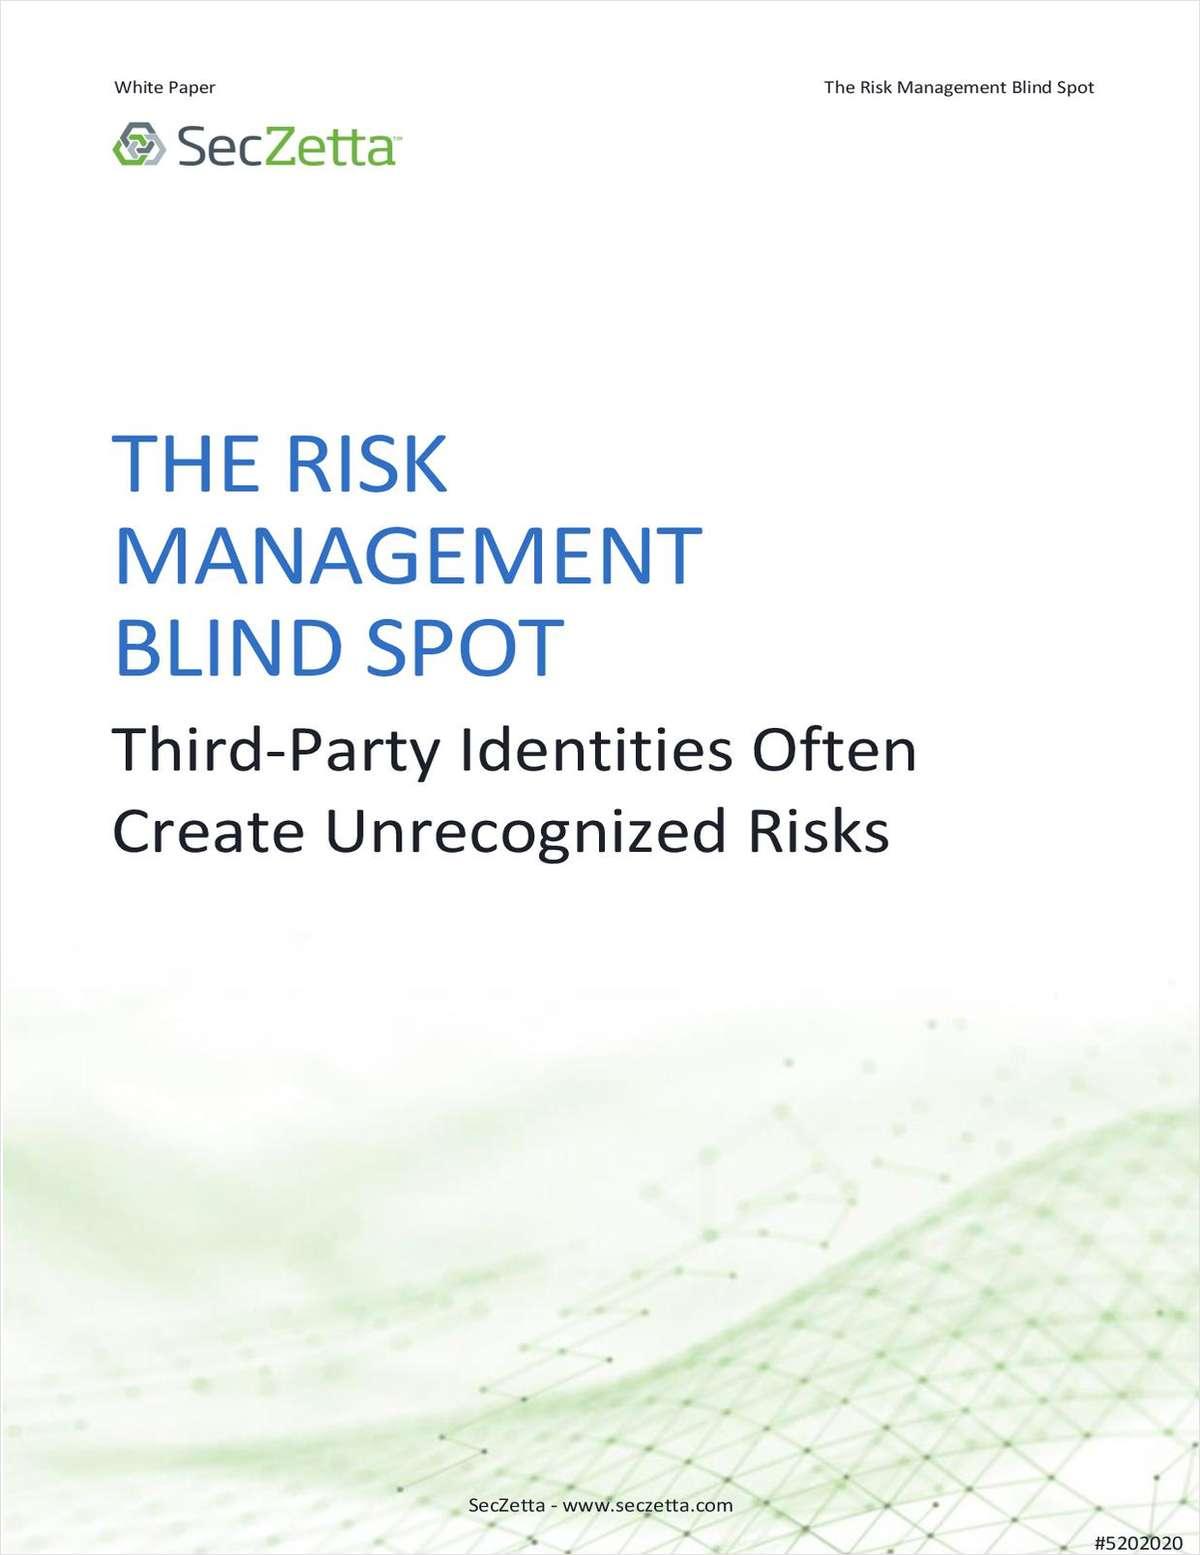 The Risk Management Blind Spot